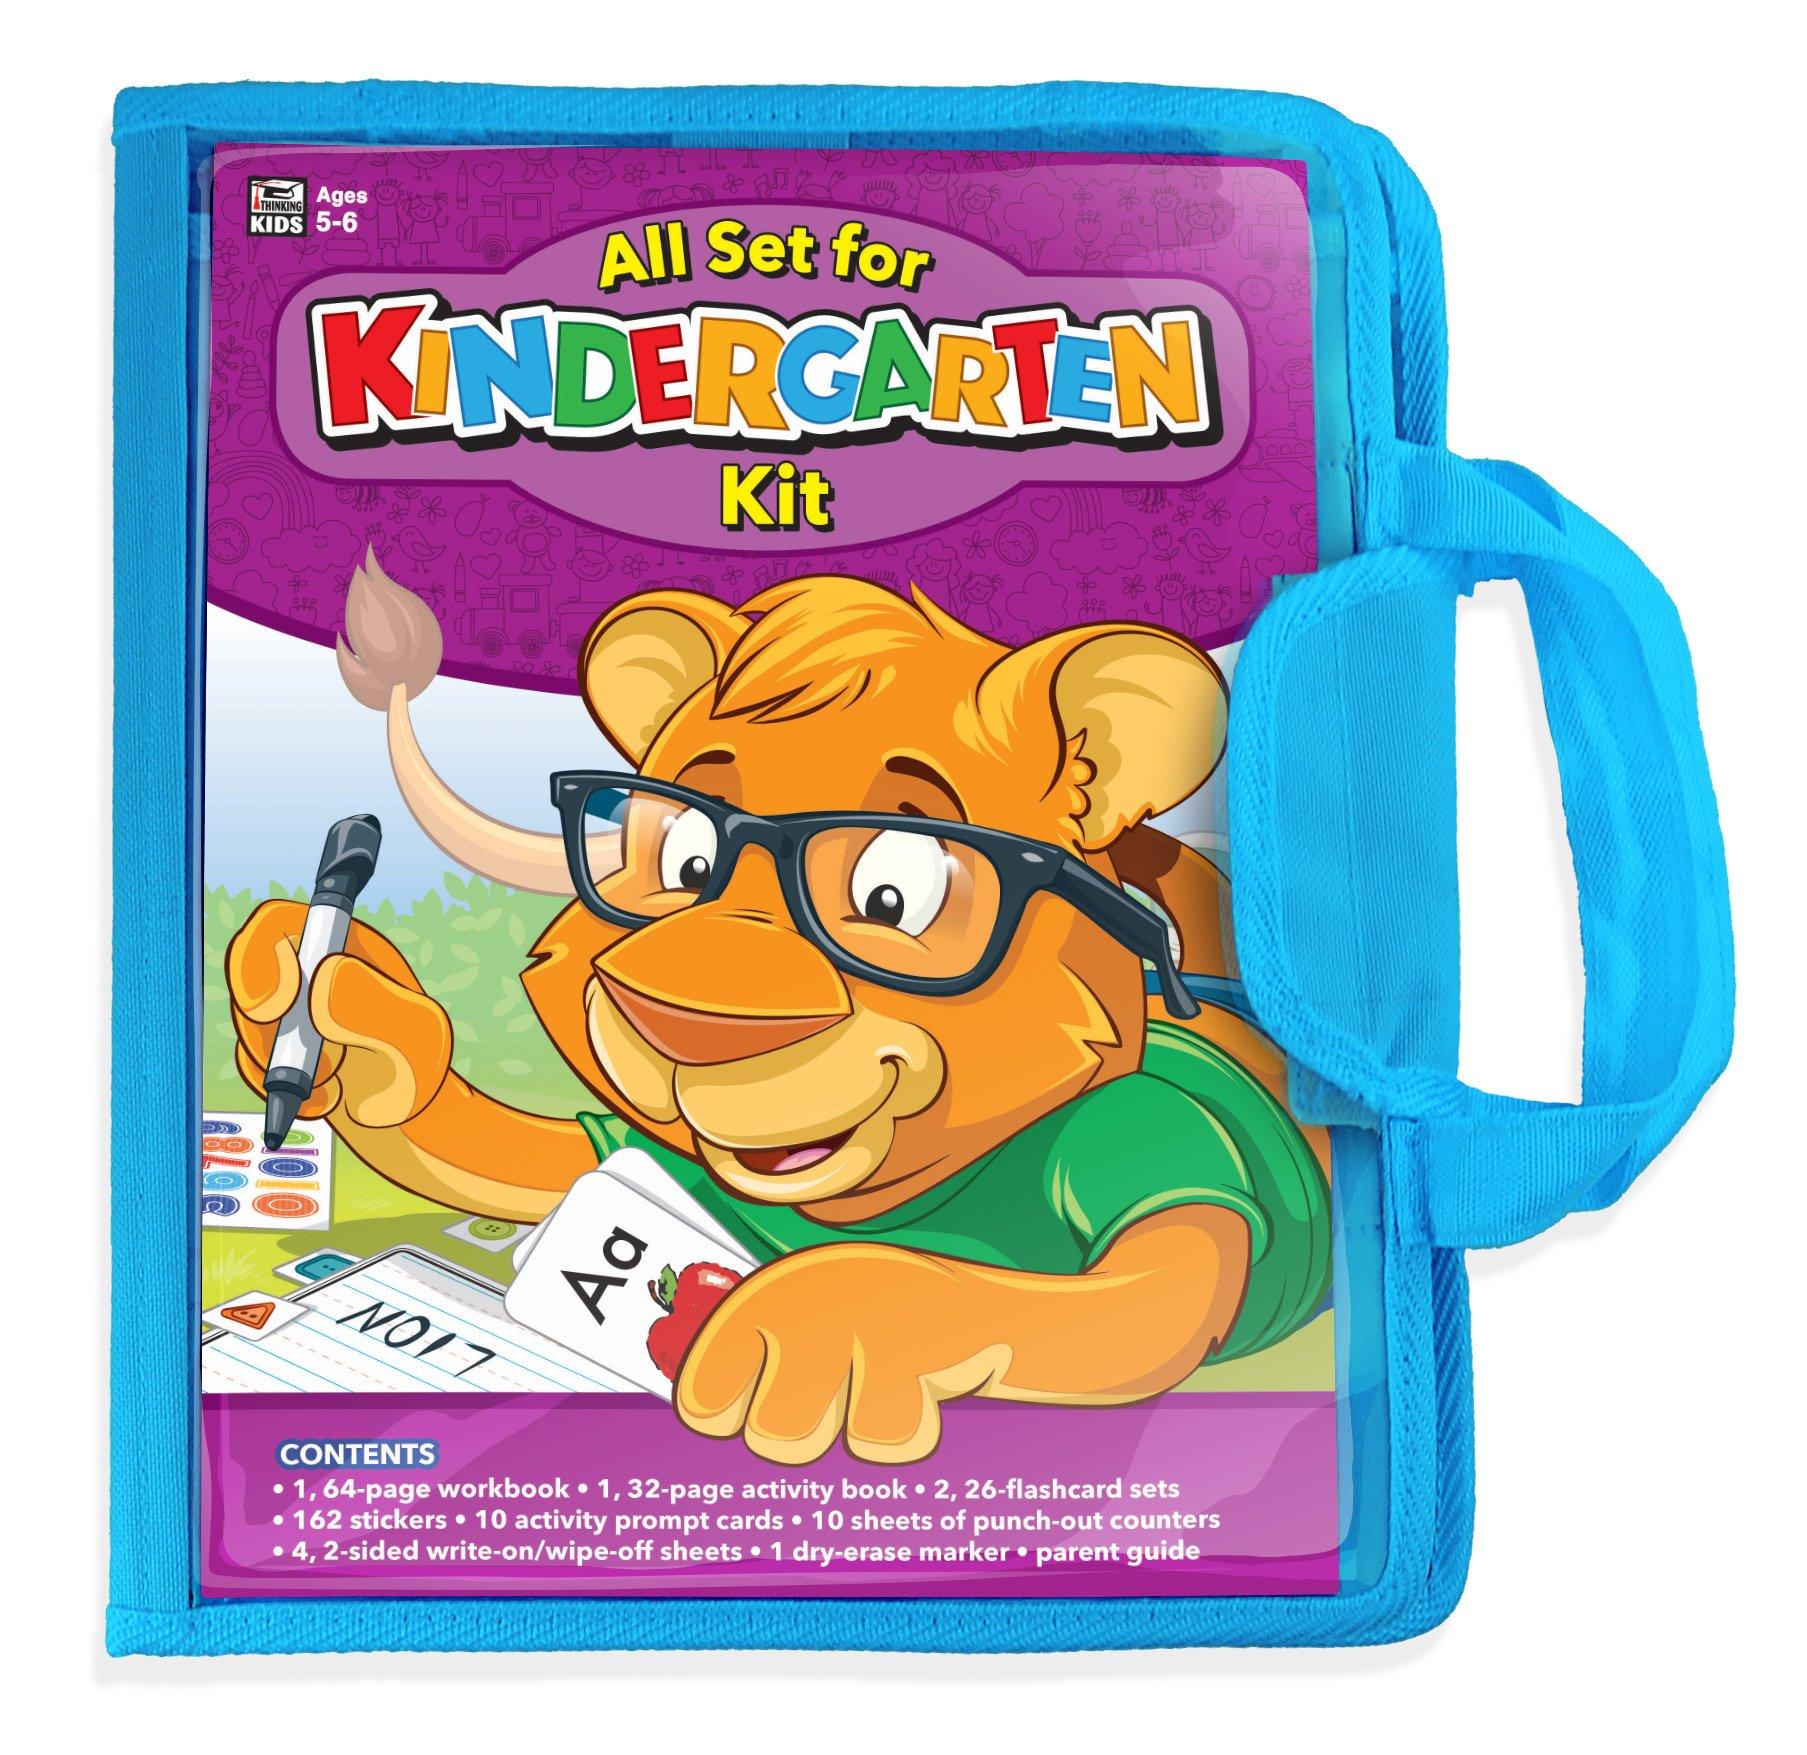 All Set for Kindergarten Kit PDF